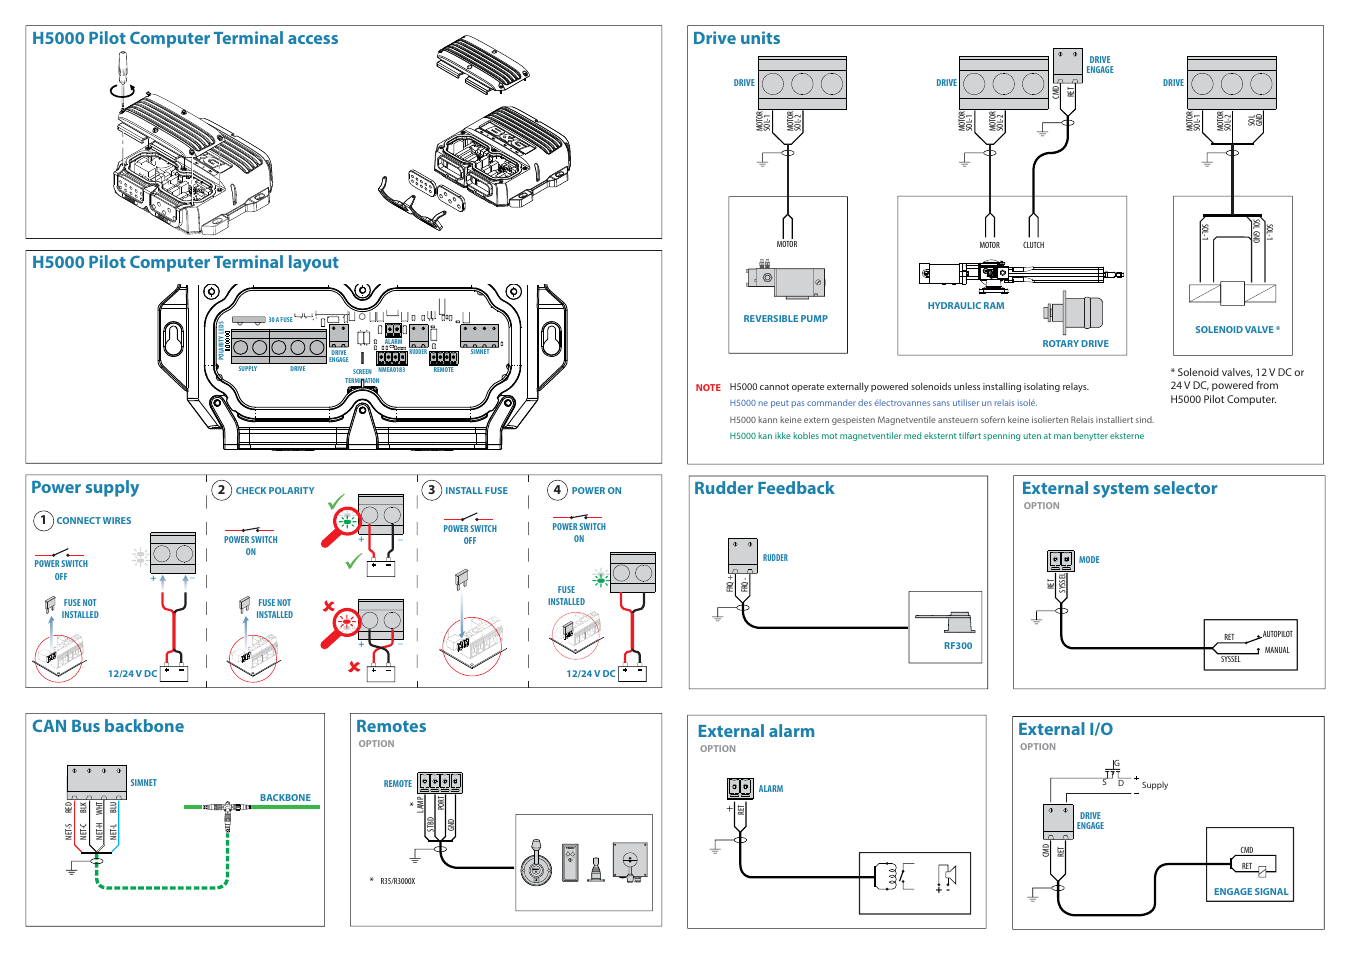 Computer Terminal Wiring Diagram Library Simrad H5000 Pilot Layout Bg User Manual Page